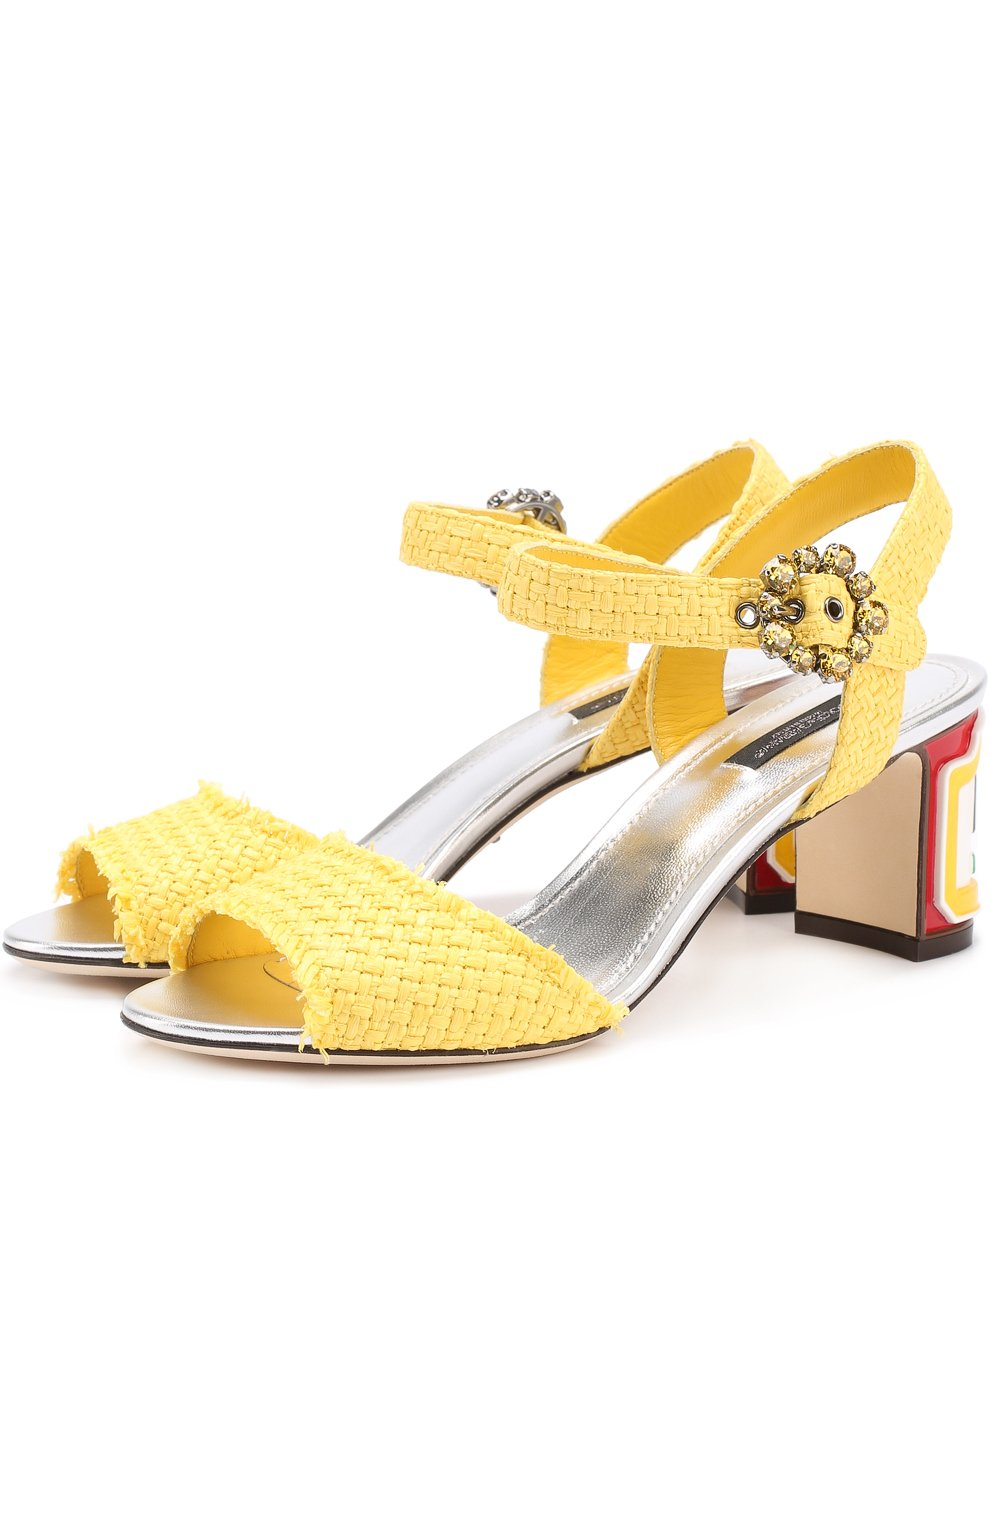 Плетеные босоножки Keira на каблуке с декором   Фото №1